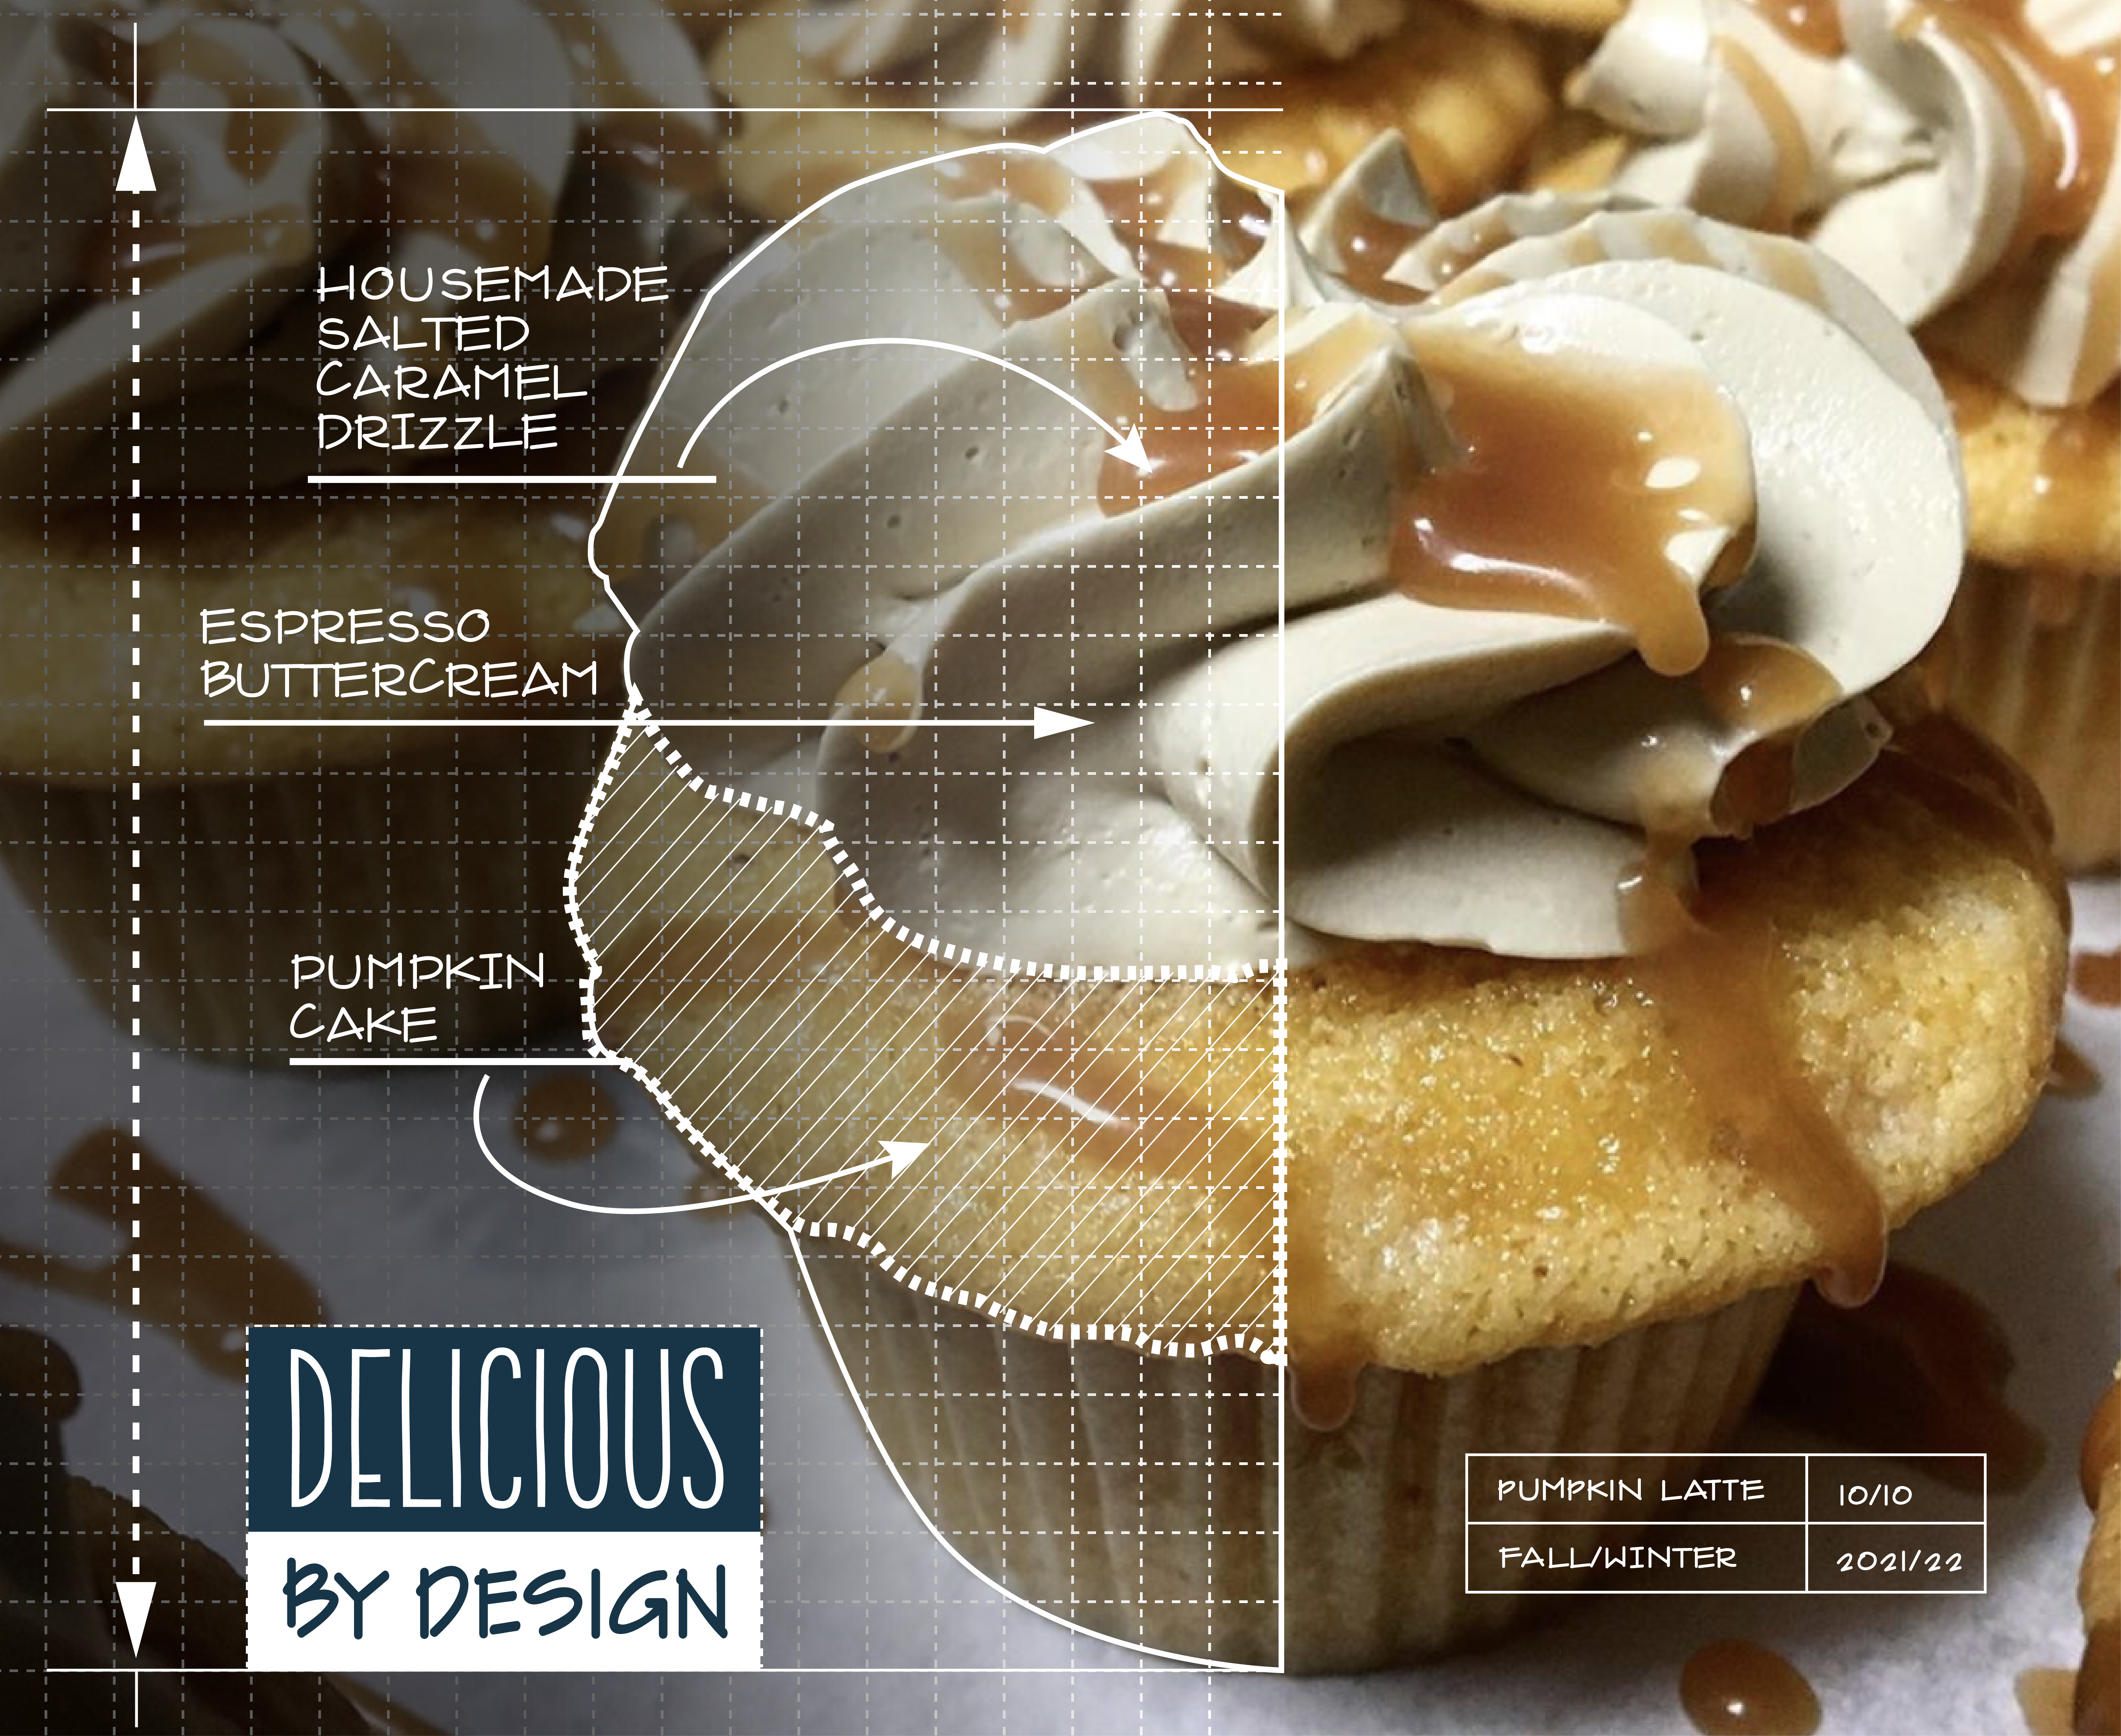 Delicious by design cupcake blueprint